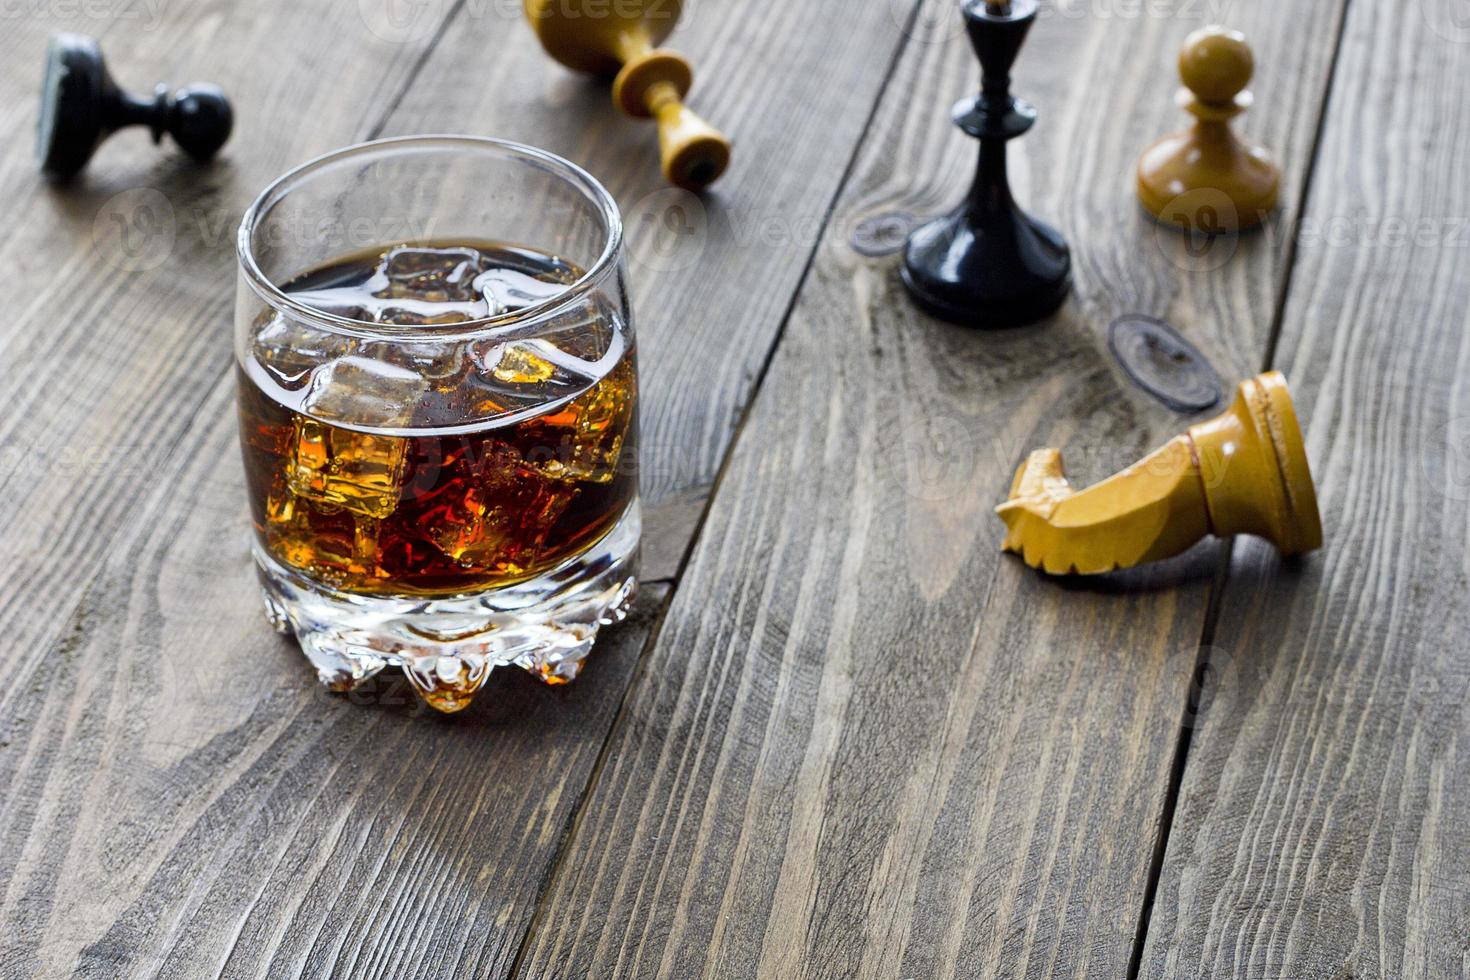 uísque e xadrez foto